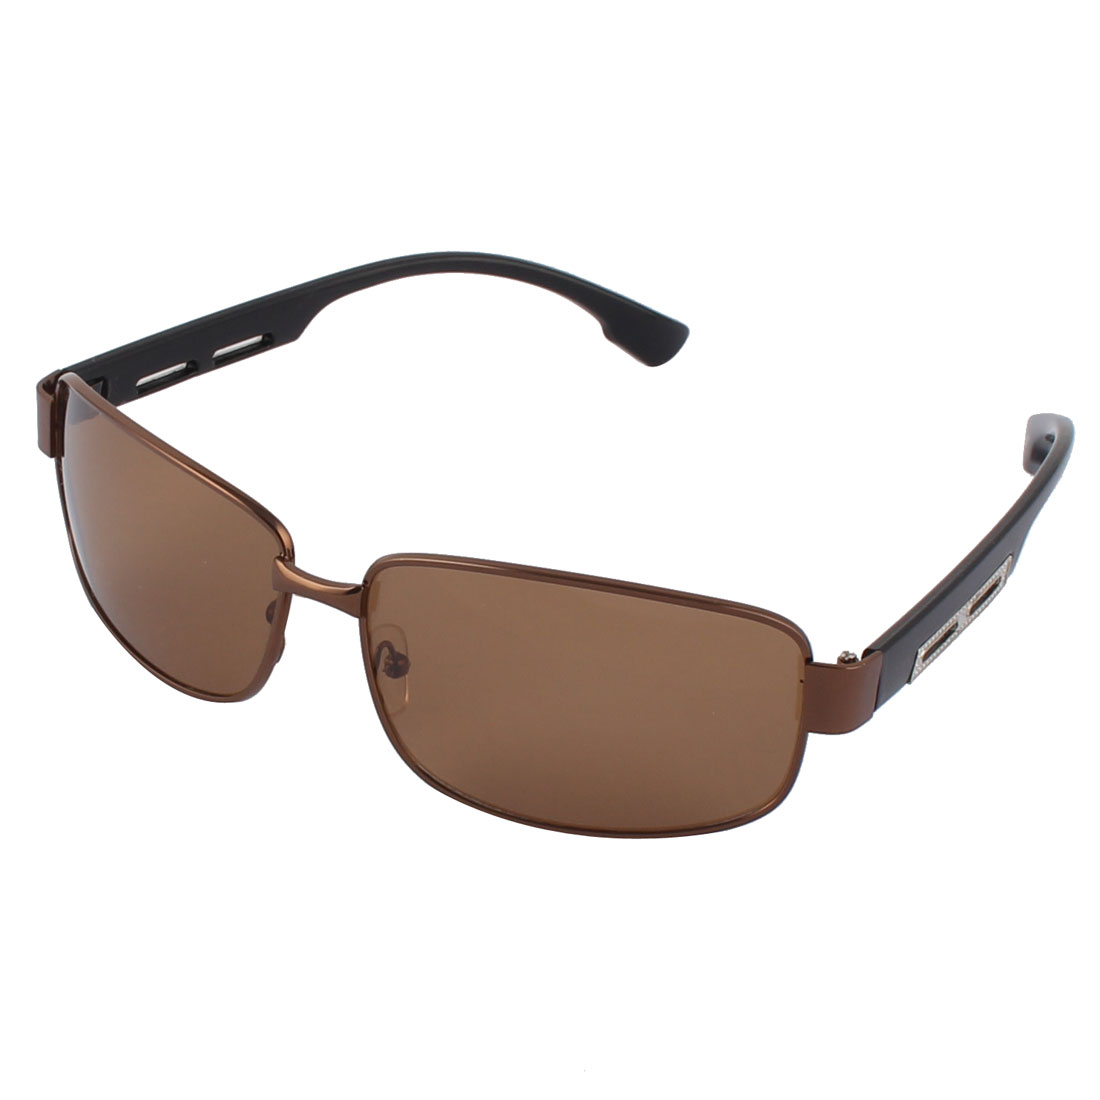 Men Driving Squre Brown Lens Full Frame Black Arms Polarized Sunglasses